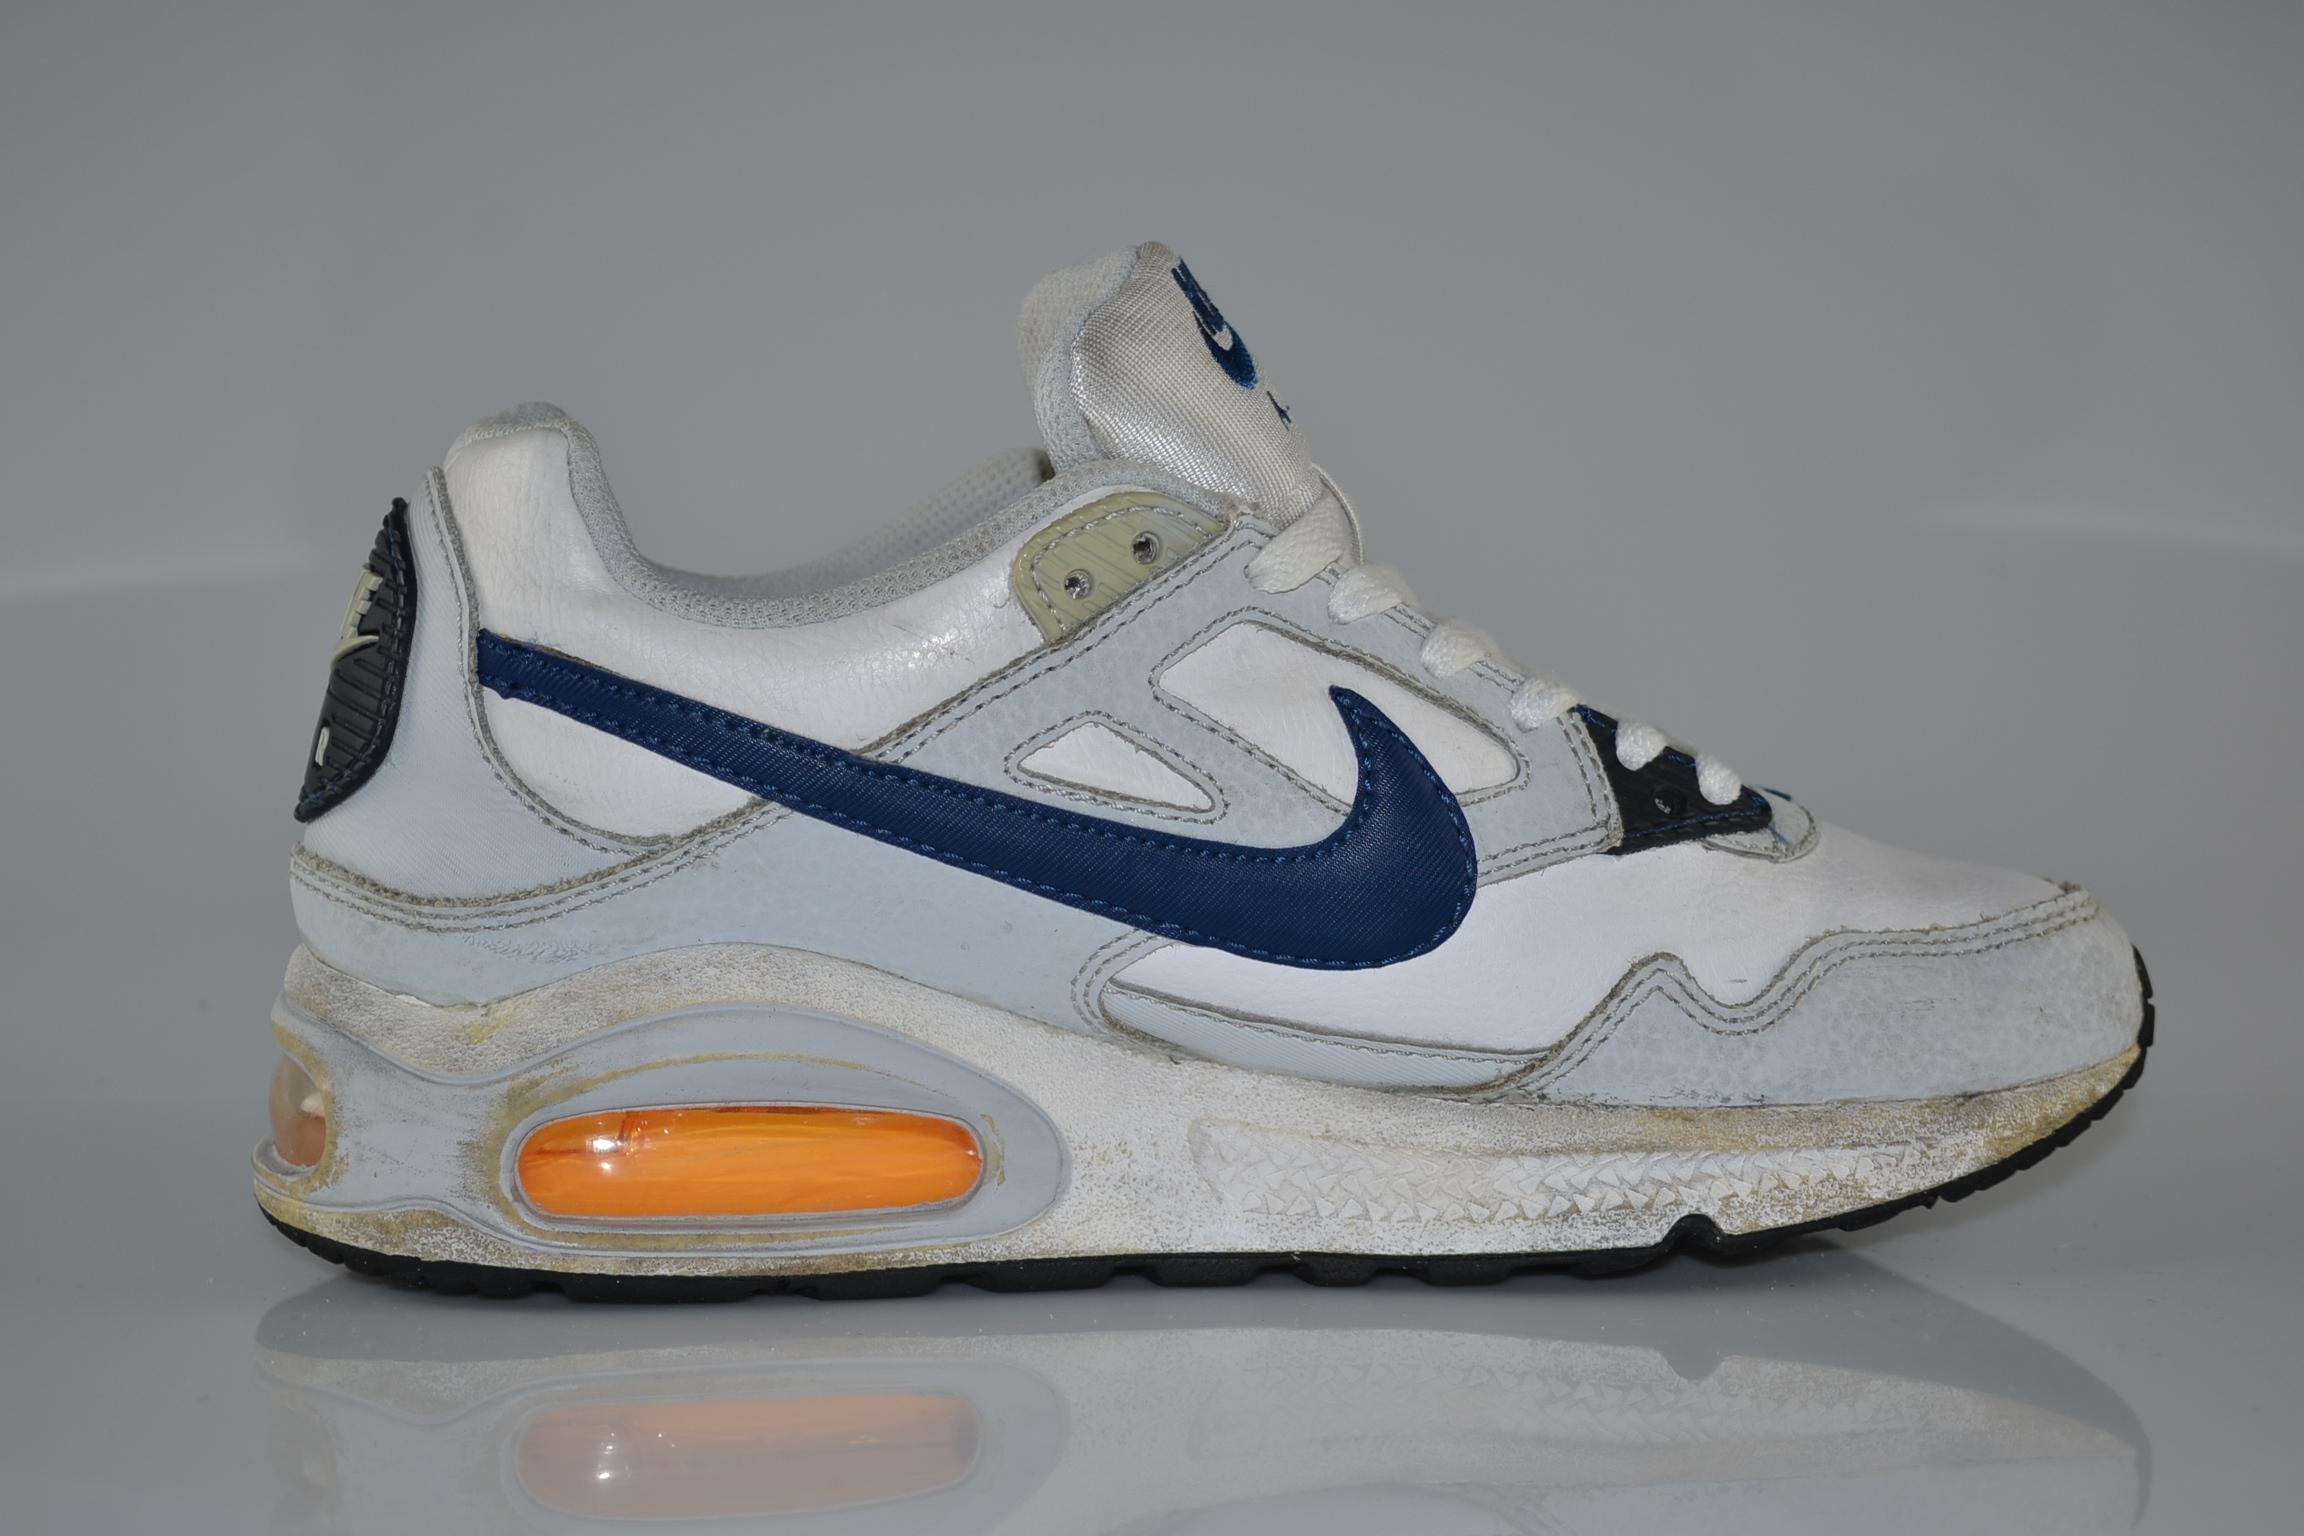 best sneakers d9304 c9d29 BUTY SPORTOWE NIKE AIR MAX COMMAND ROZMIAR 38 - 6949618046 ...